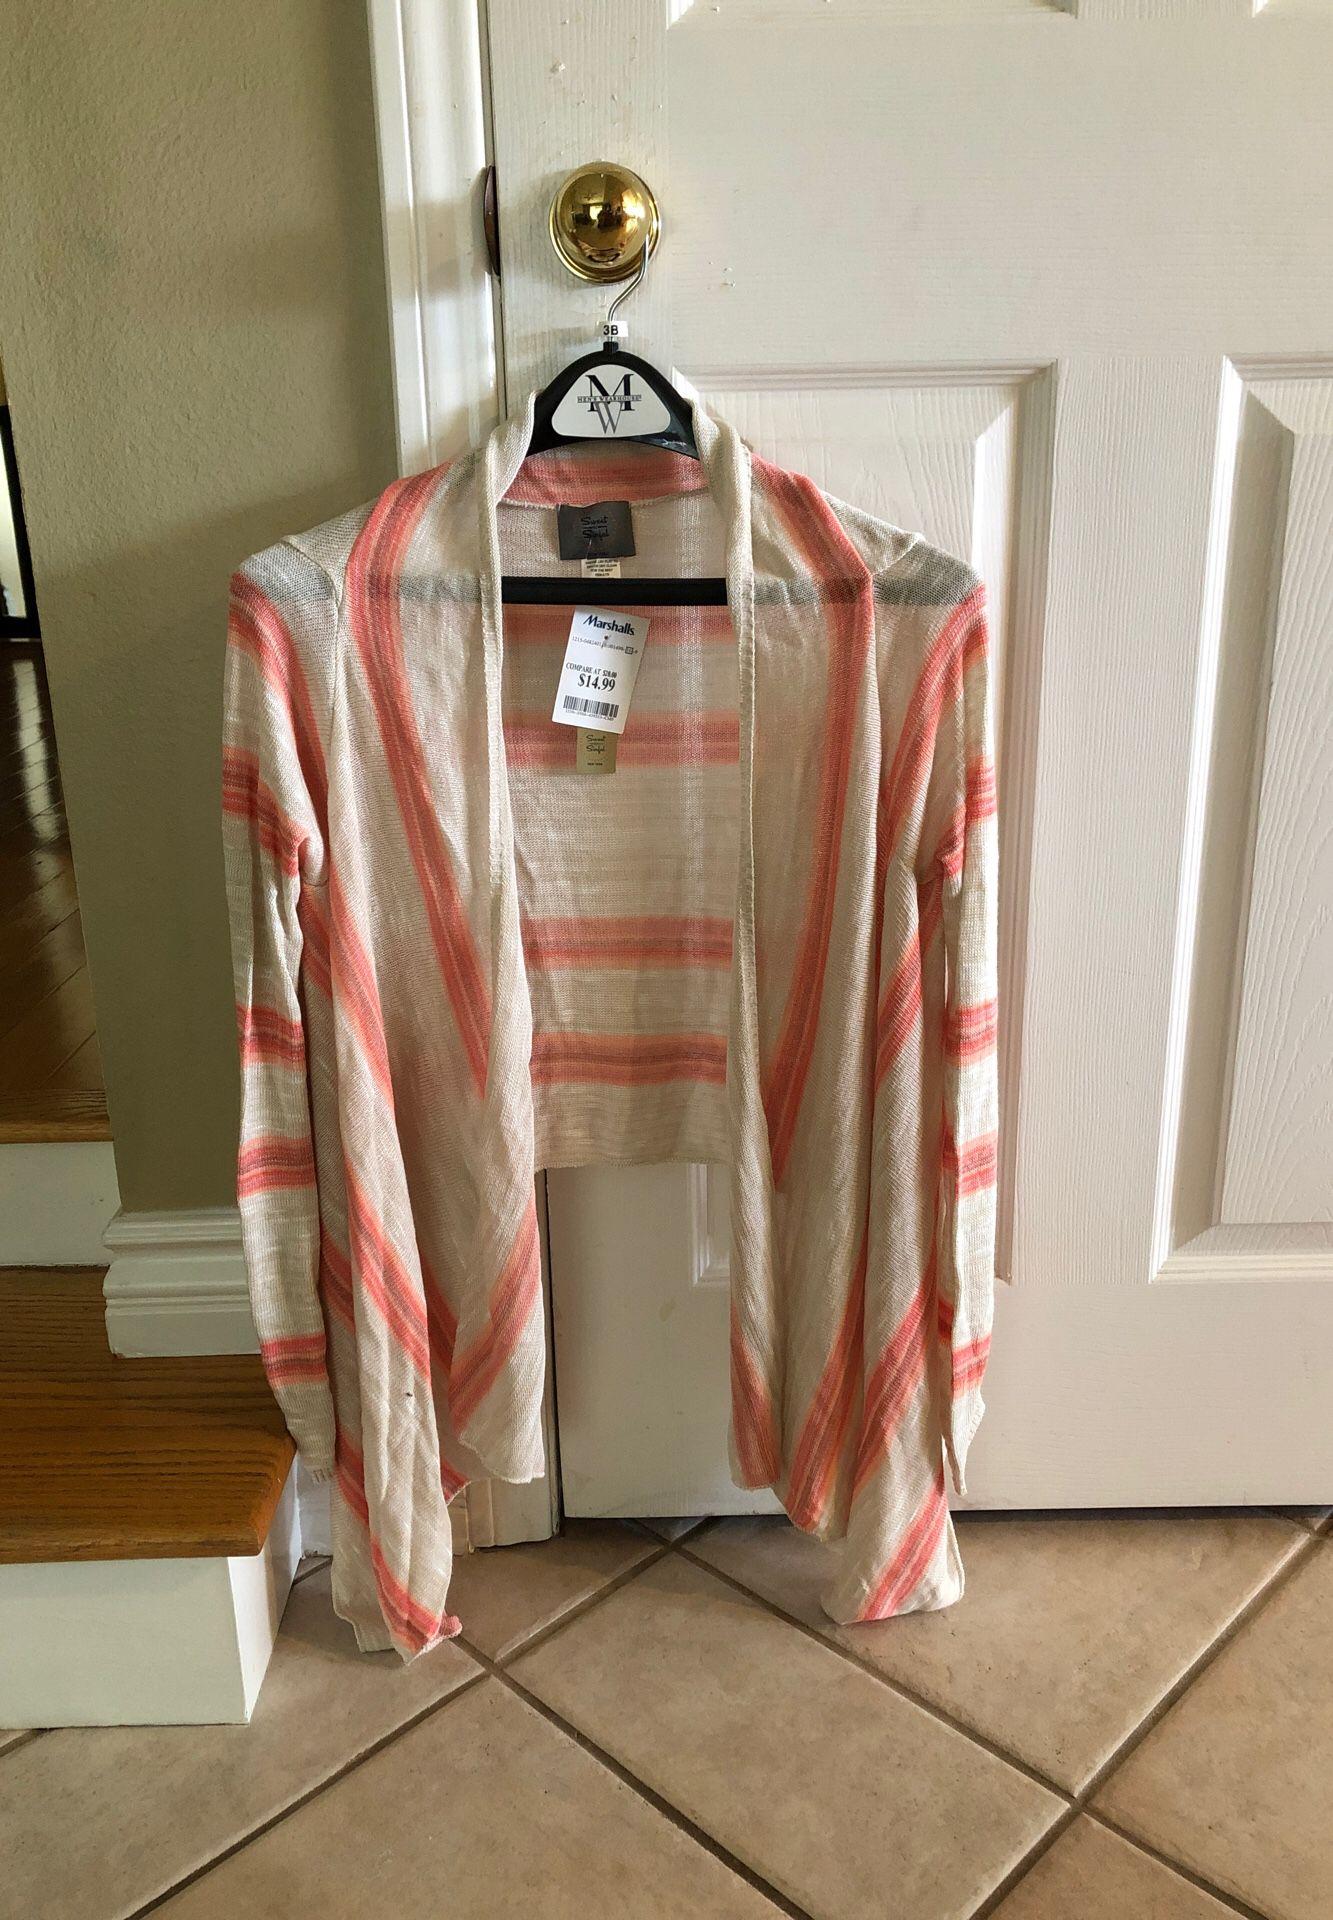 Lightweight - brand new sweater